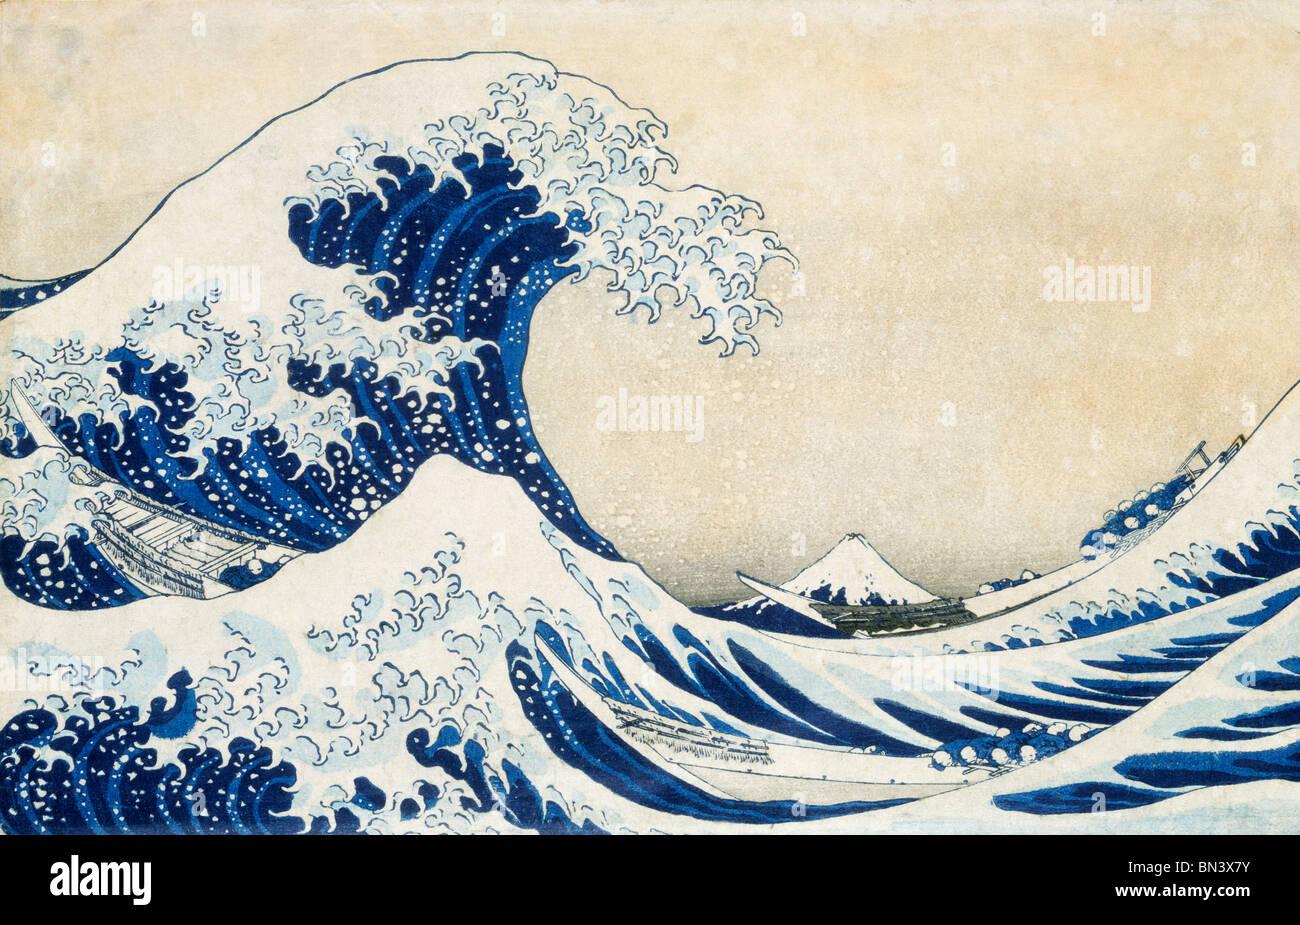 Die große Welle von Katsushika Hokusai. Japan, 19. Jahrhundert Stockfoto